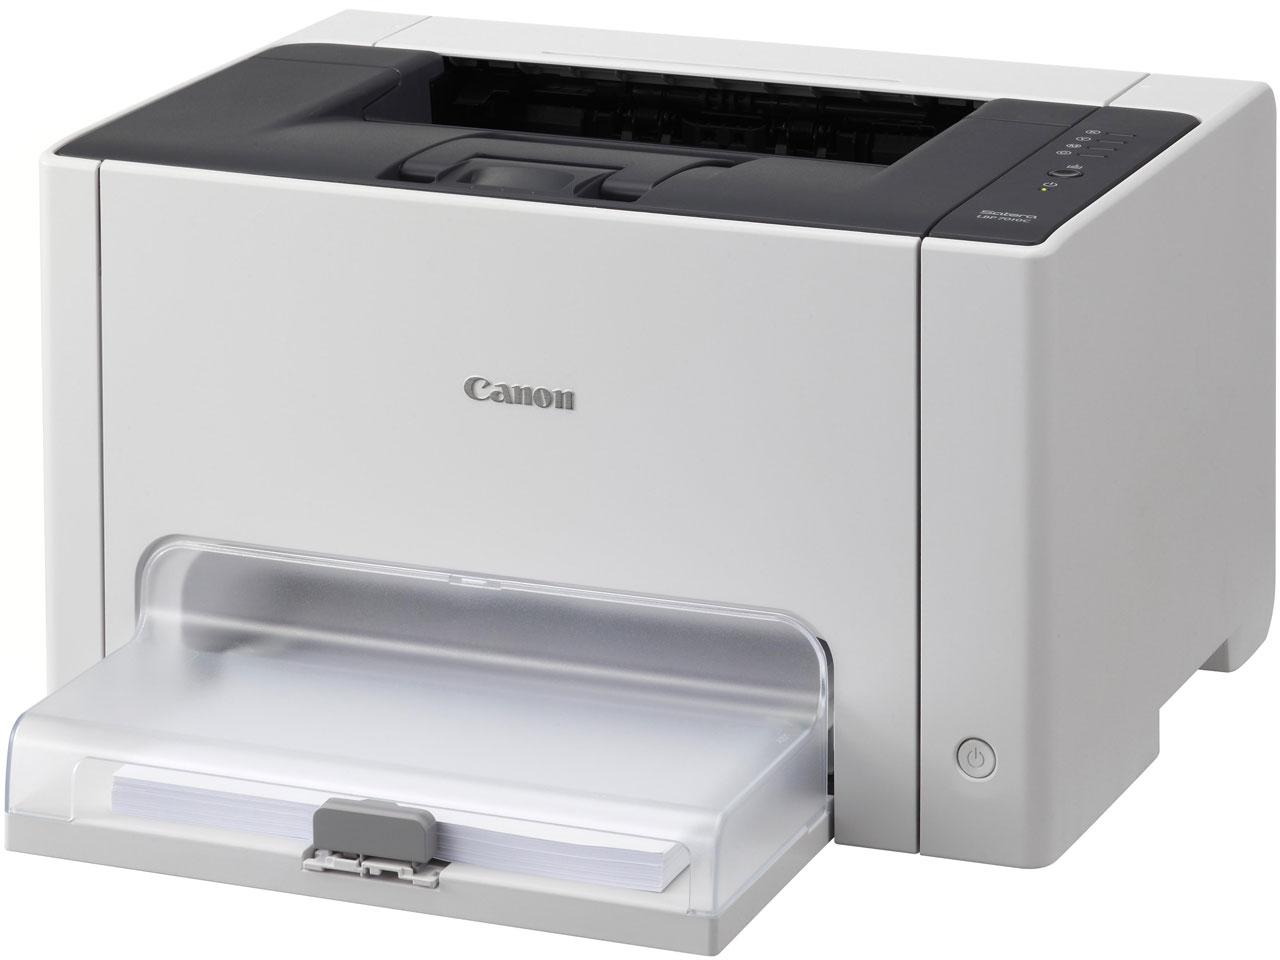 Canon Tiskárna LBP 7010C ( color, 16 str./min. Black, 4str. /min. color, A4, 600x600) white